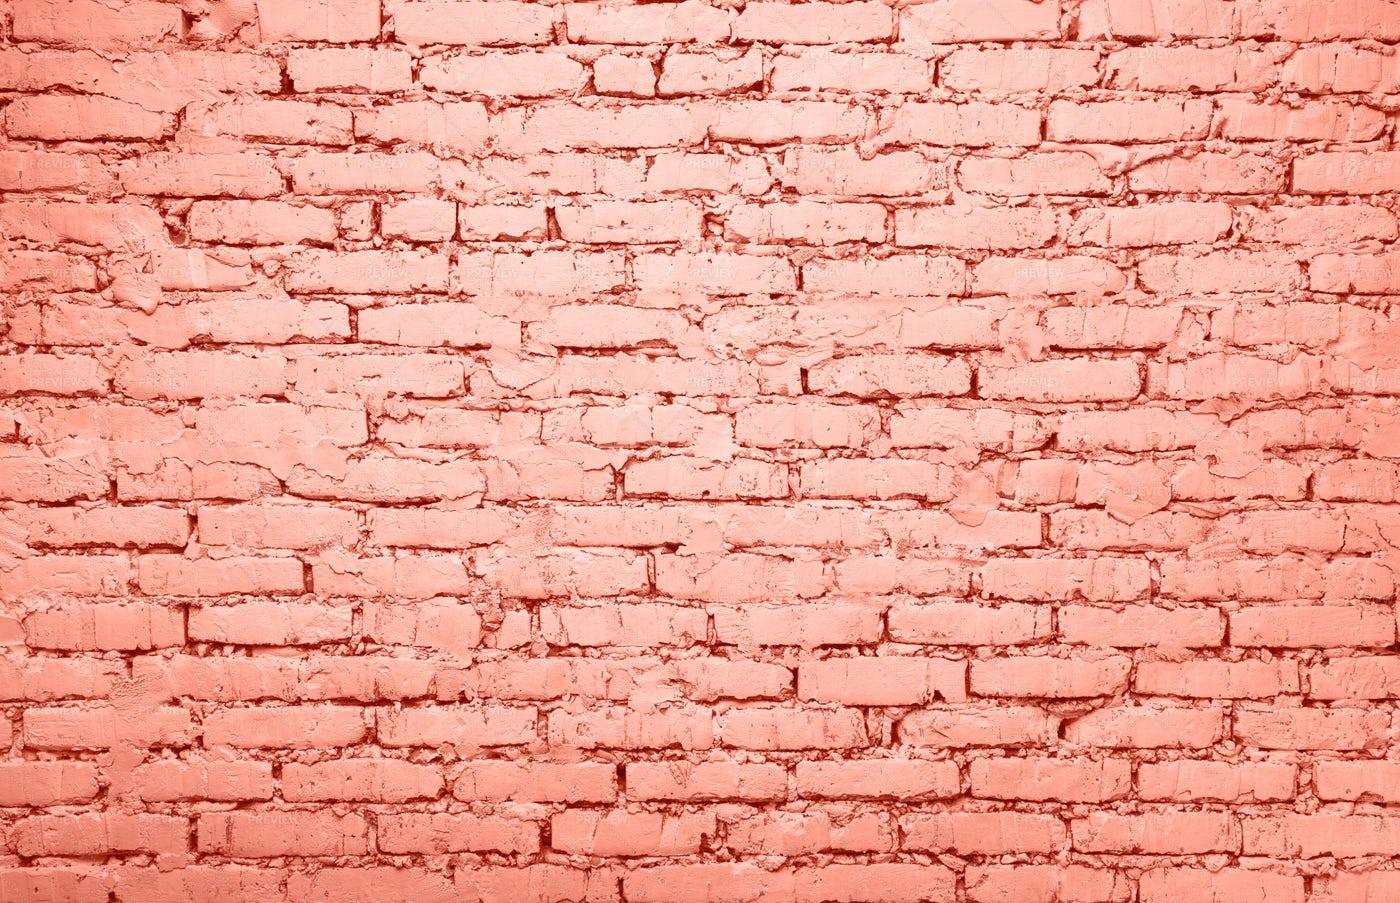 Pink Brick Wall Background: Stock Photos